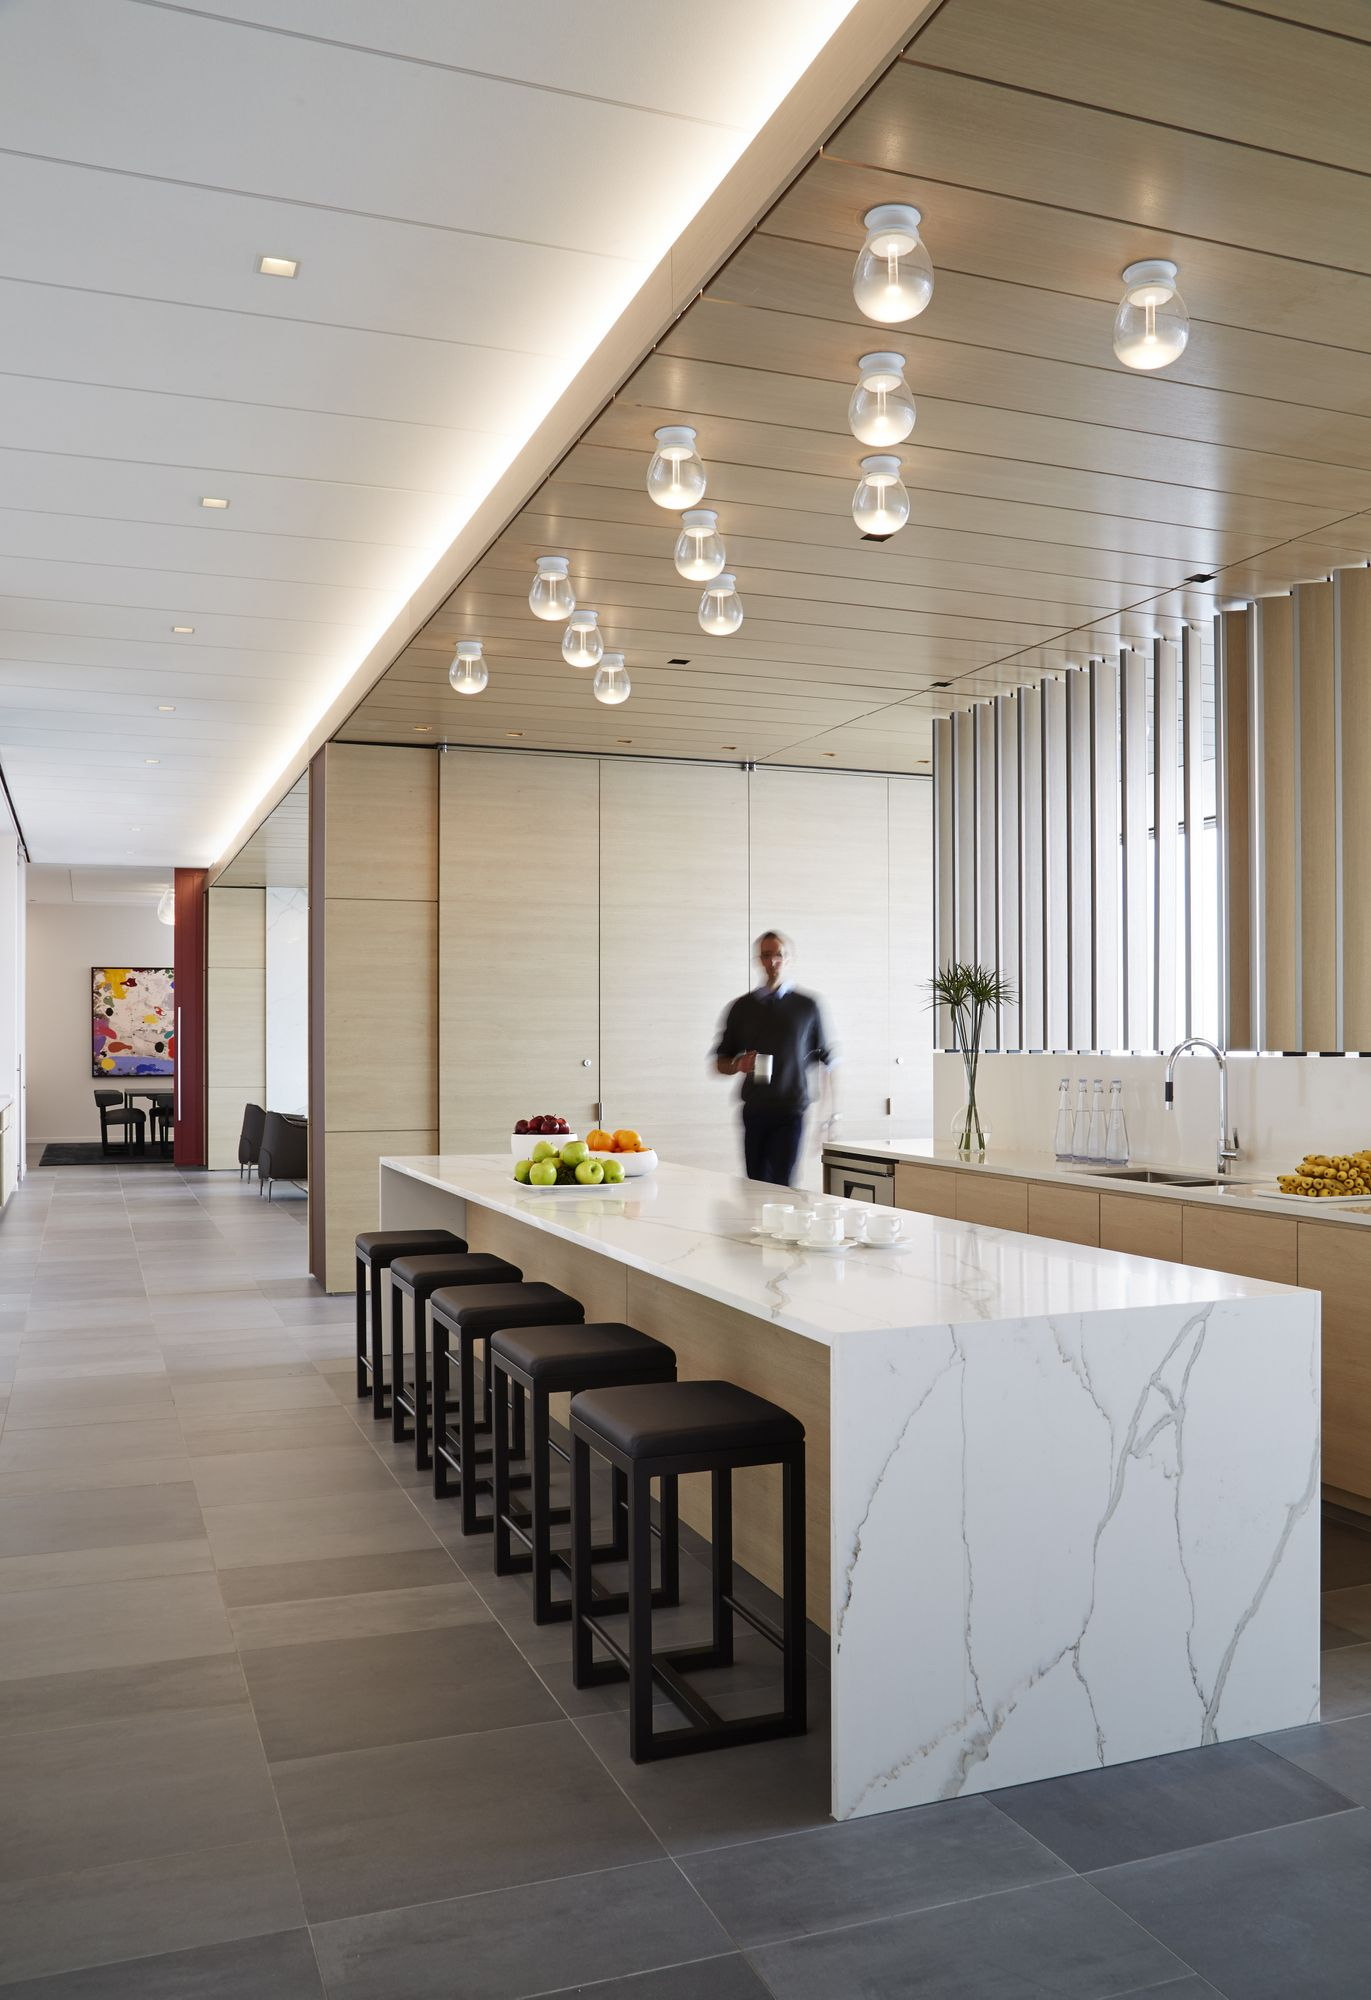 Mcdermott Will Emery Offices Chicago 7